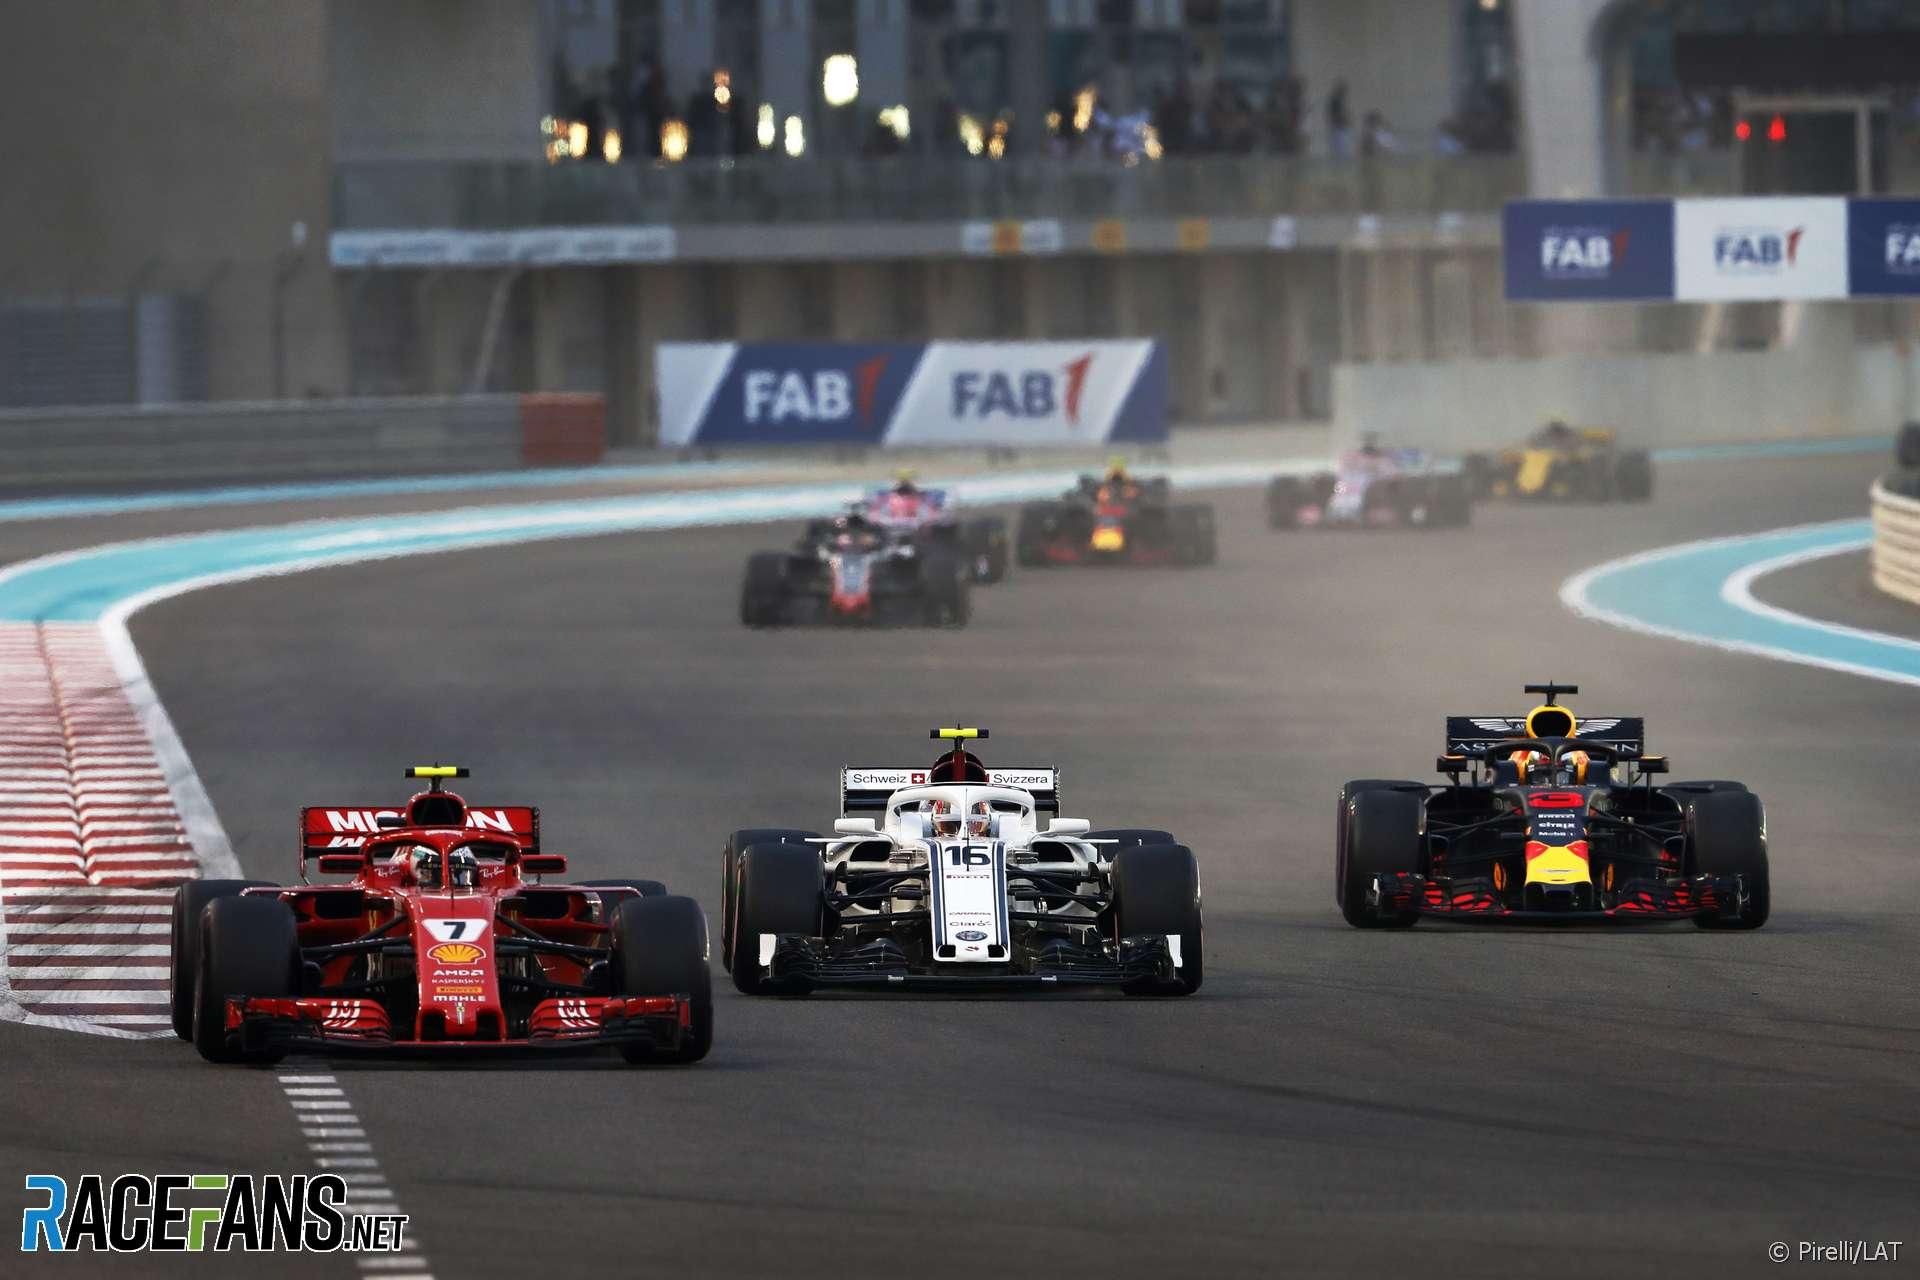 Kimi Raikkonen, Ferrari, Yas Marina, 2018